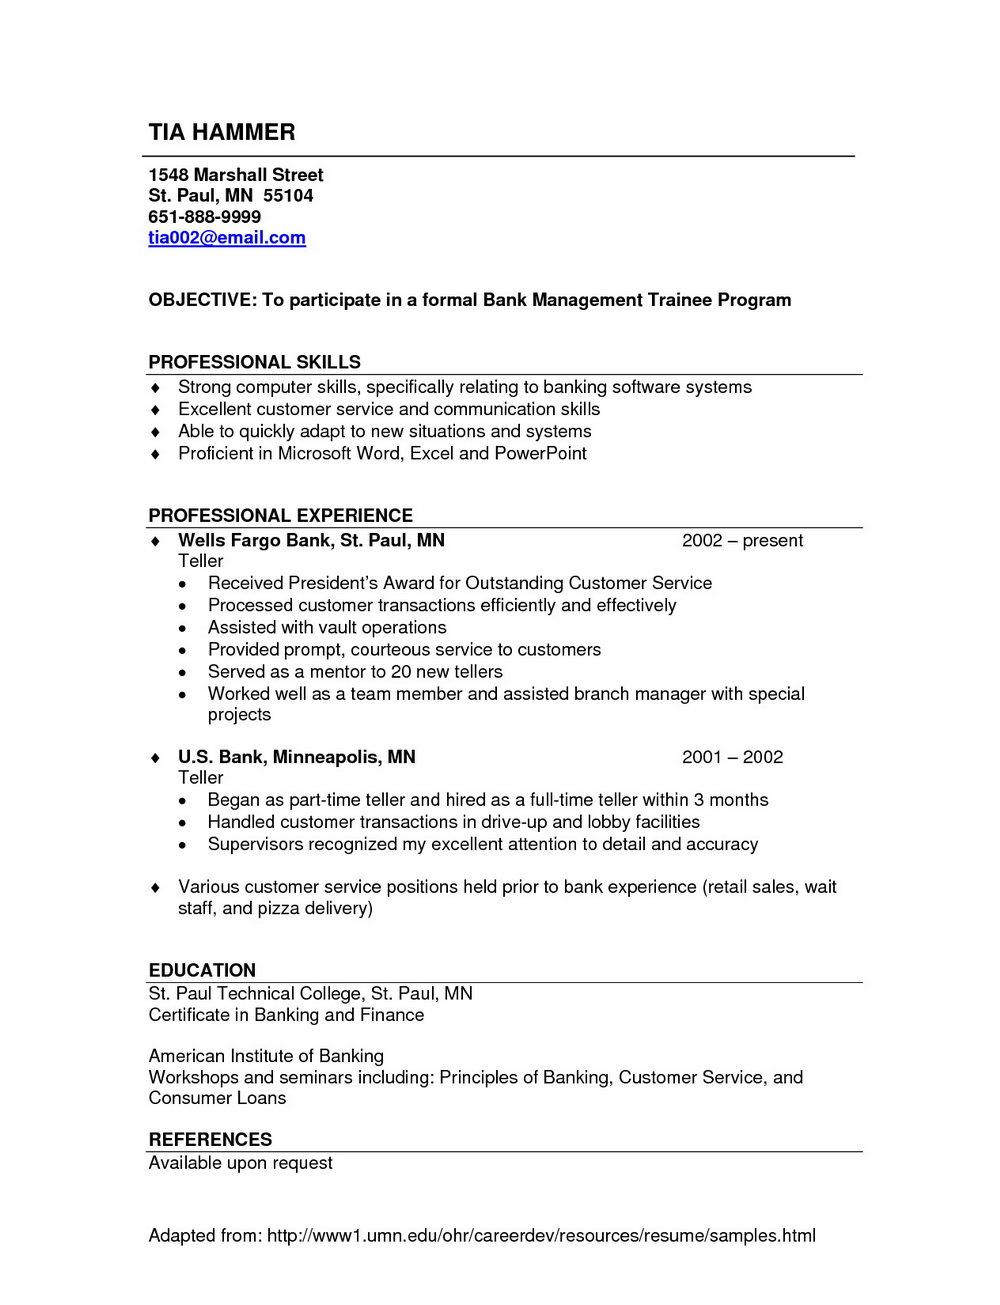 Resume Templates For Retail Jobs